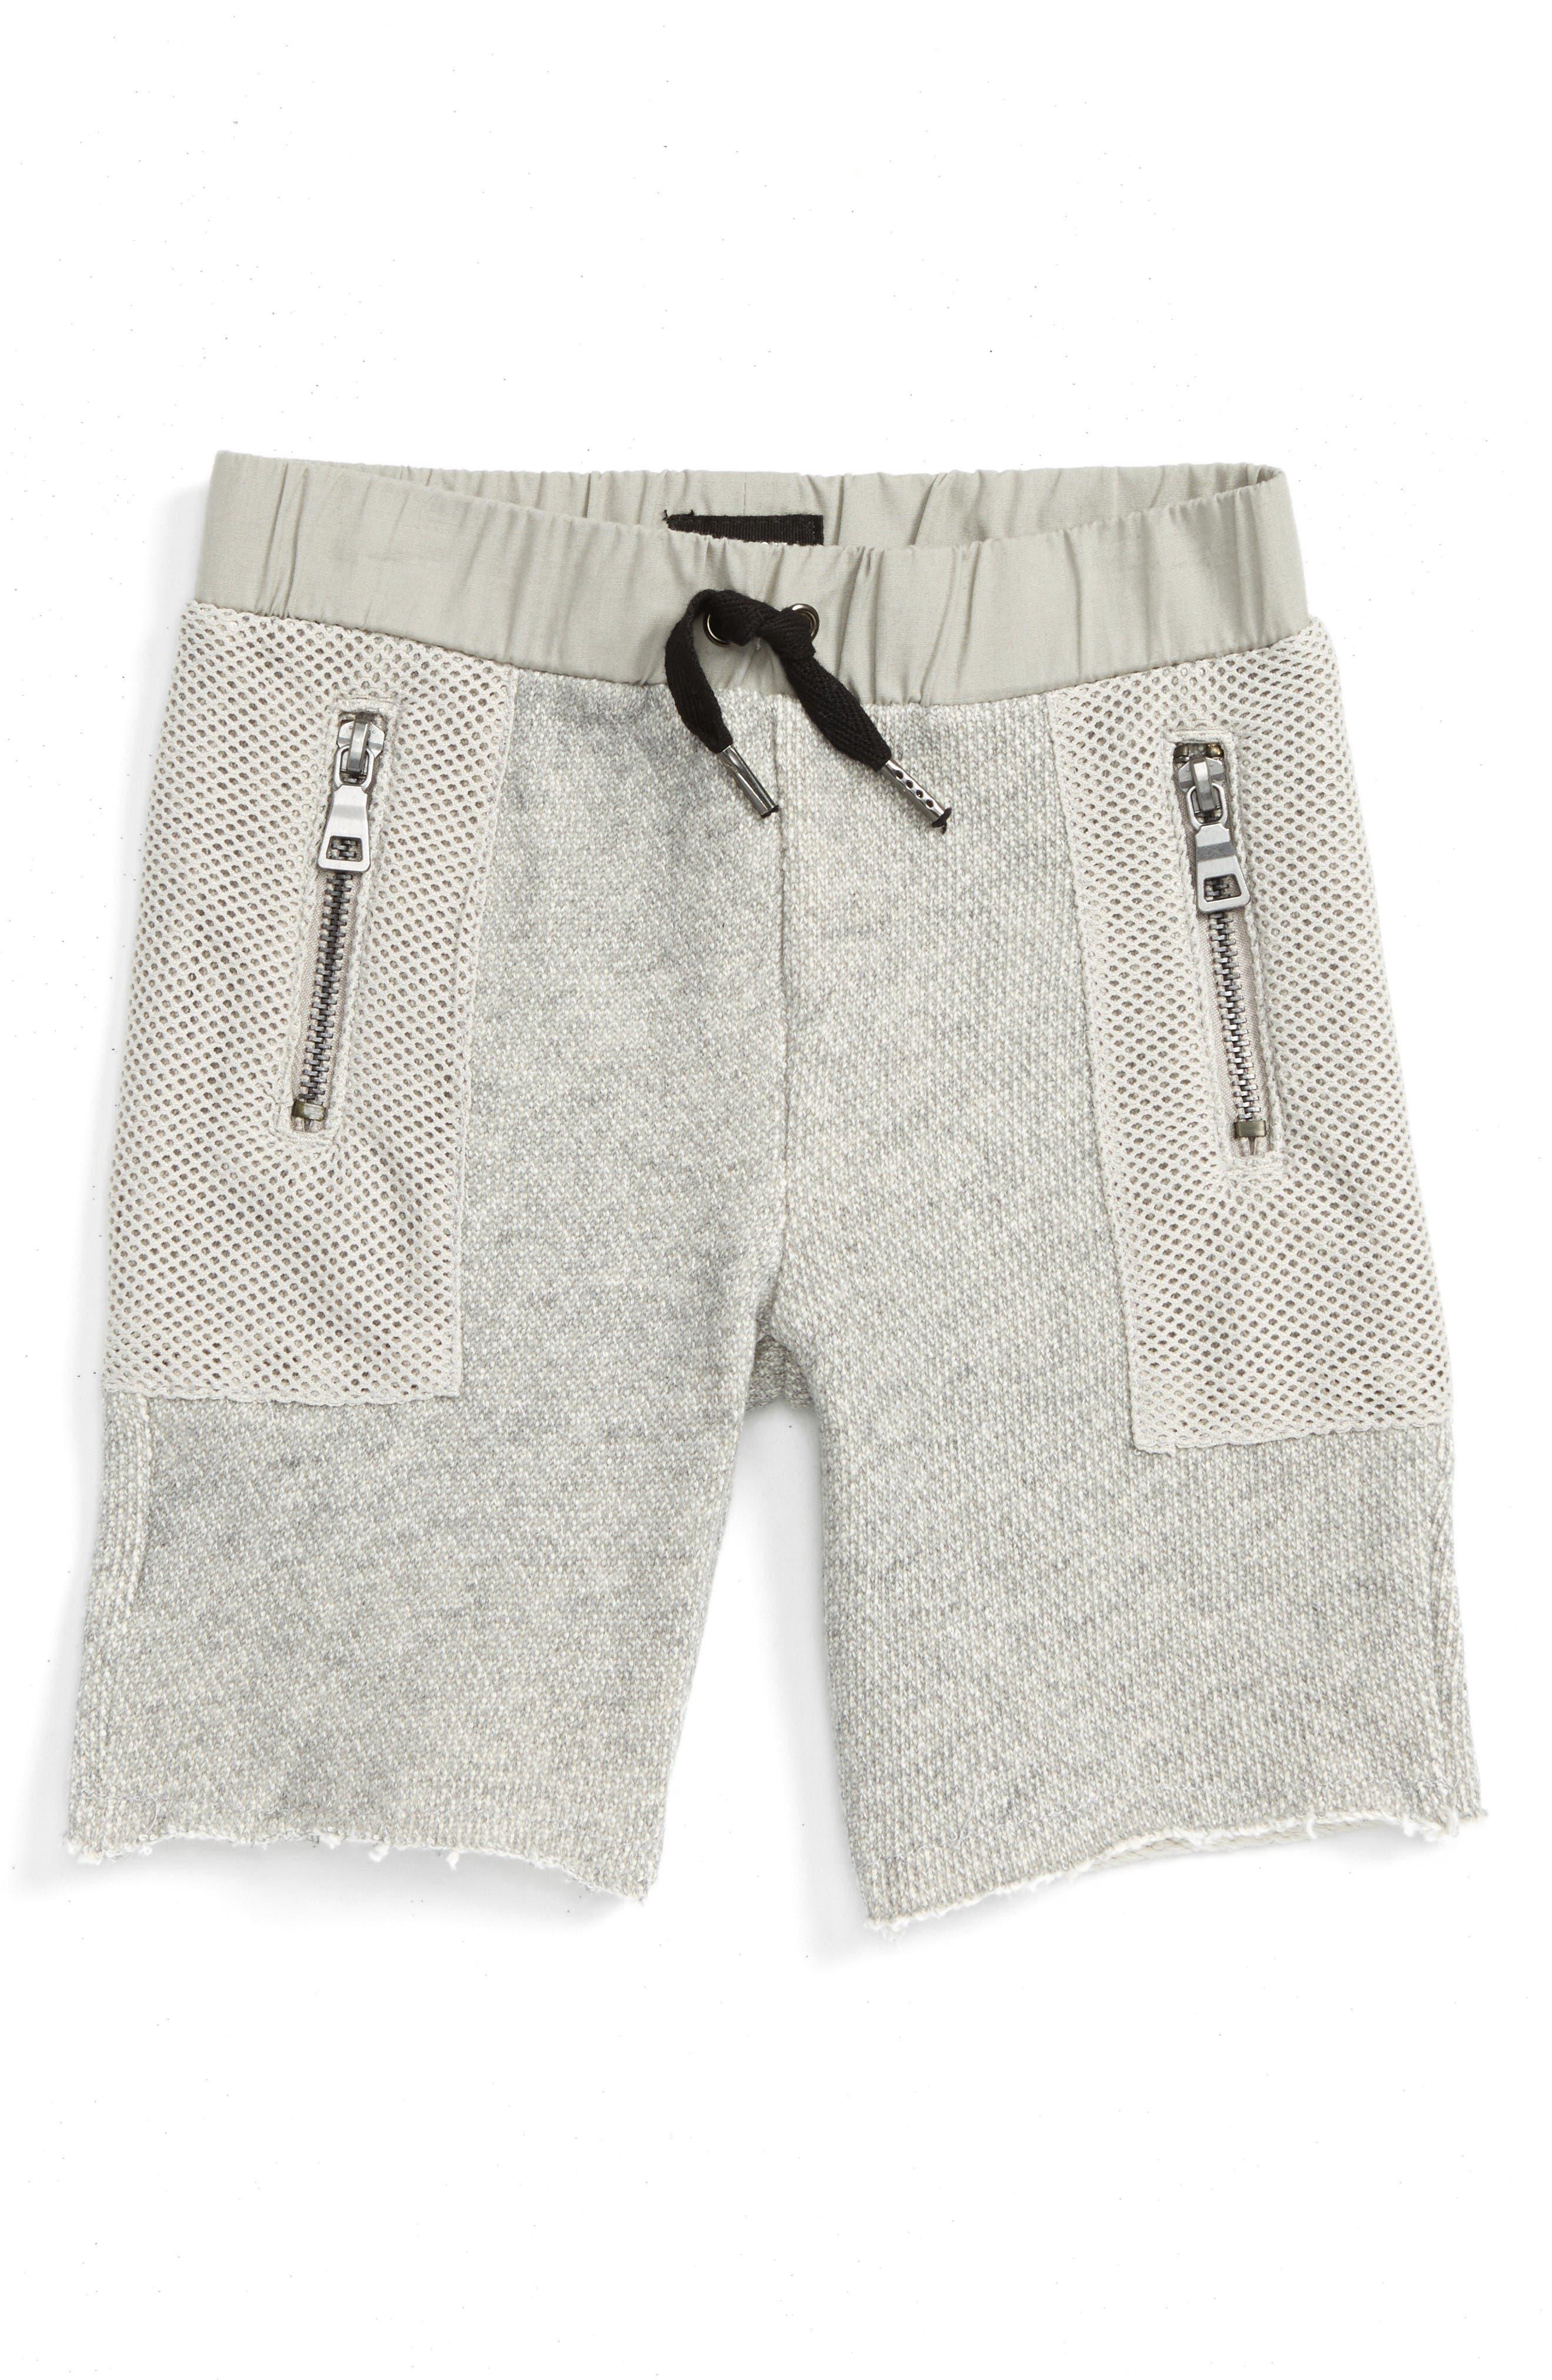 Alternate Image 1 Selected - Hudson Kids High Tech Shorts (Baby Boys)